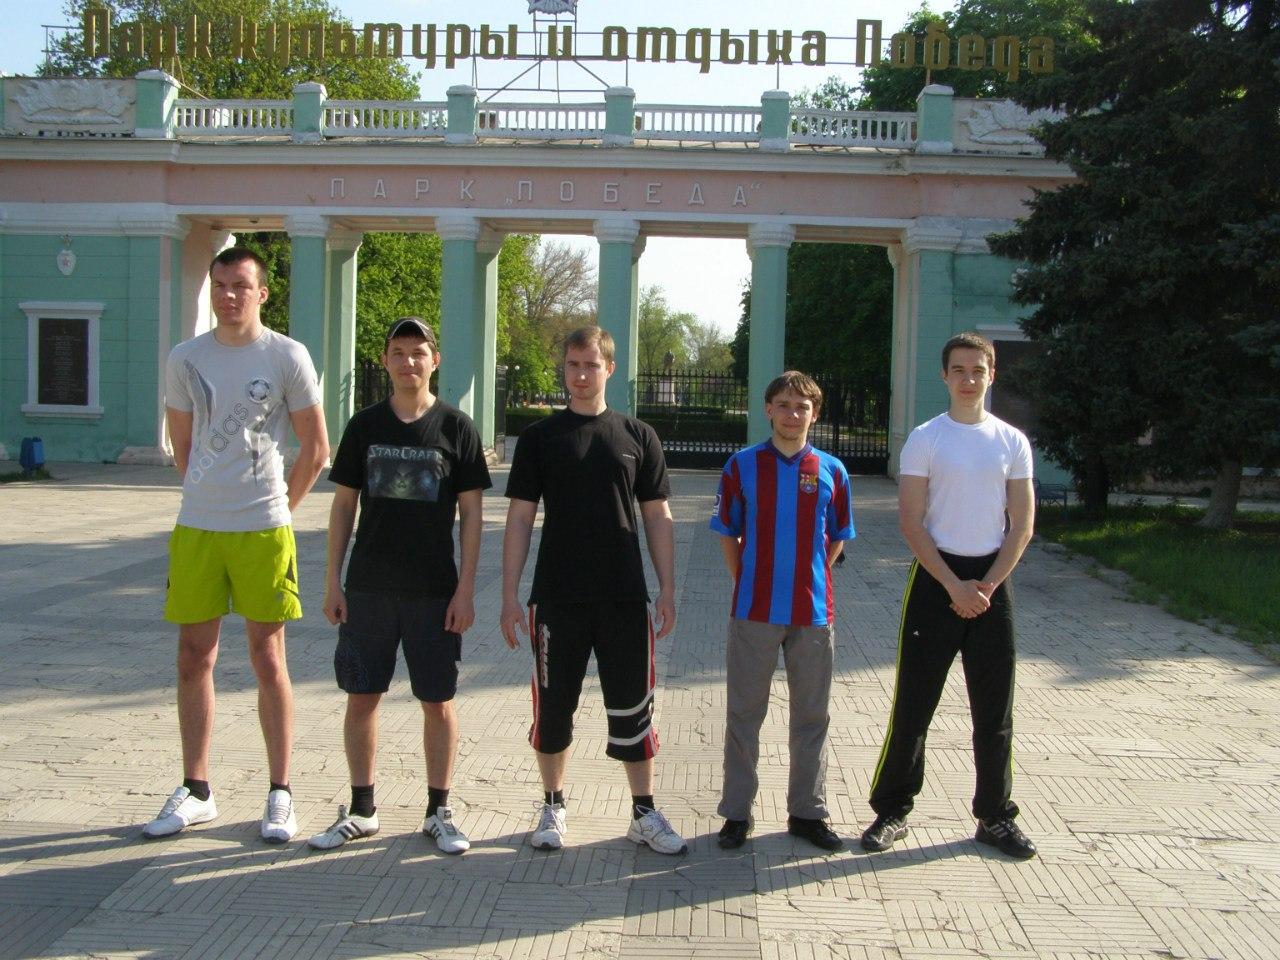 Приднестровская пробежка 29.04.2012